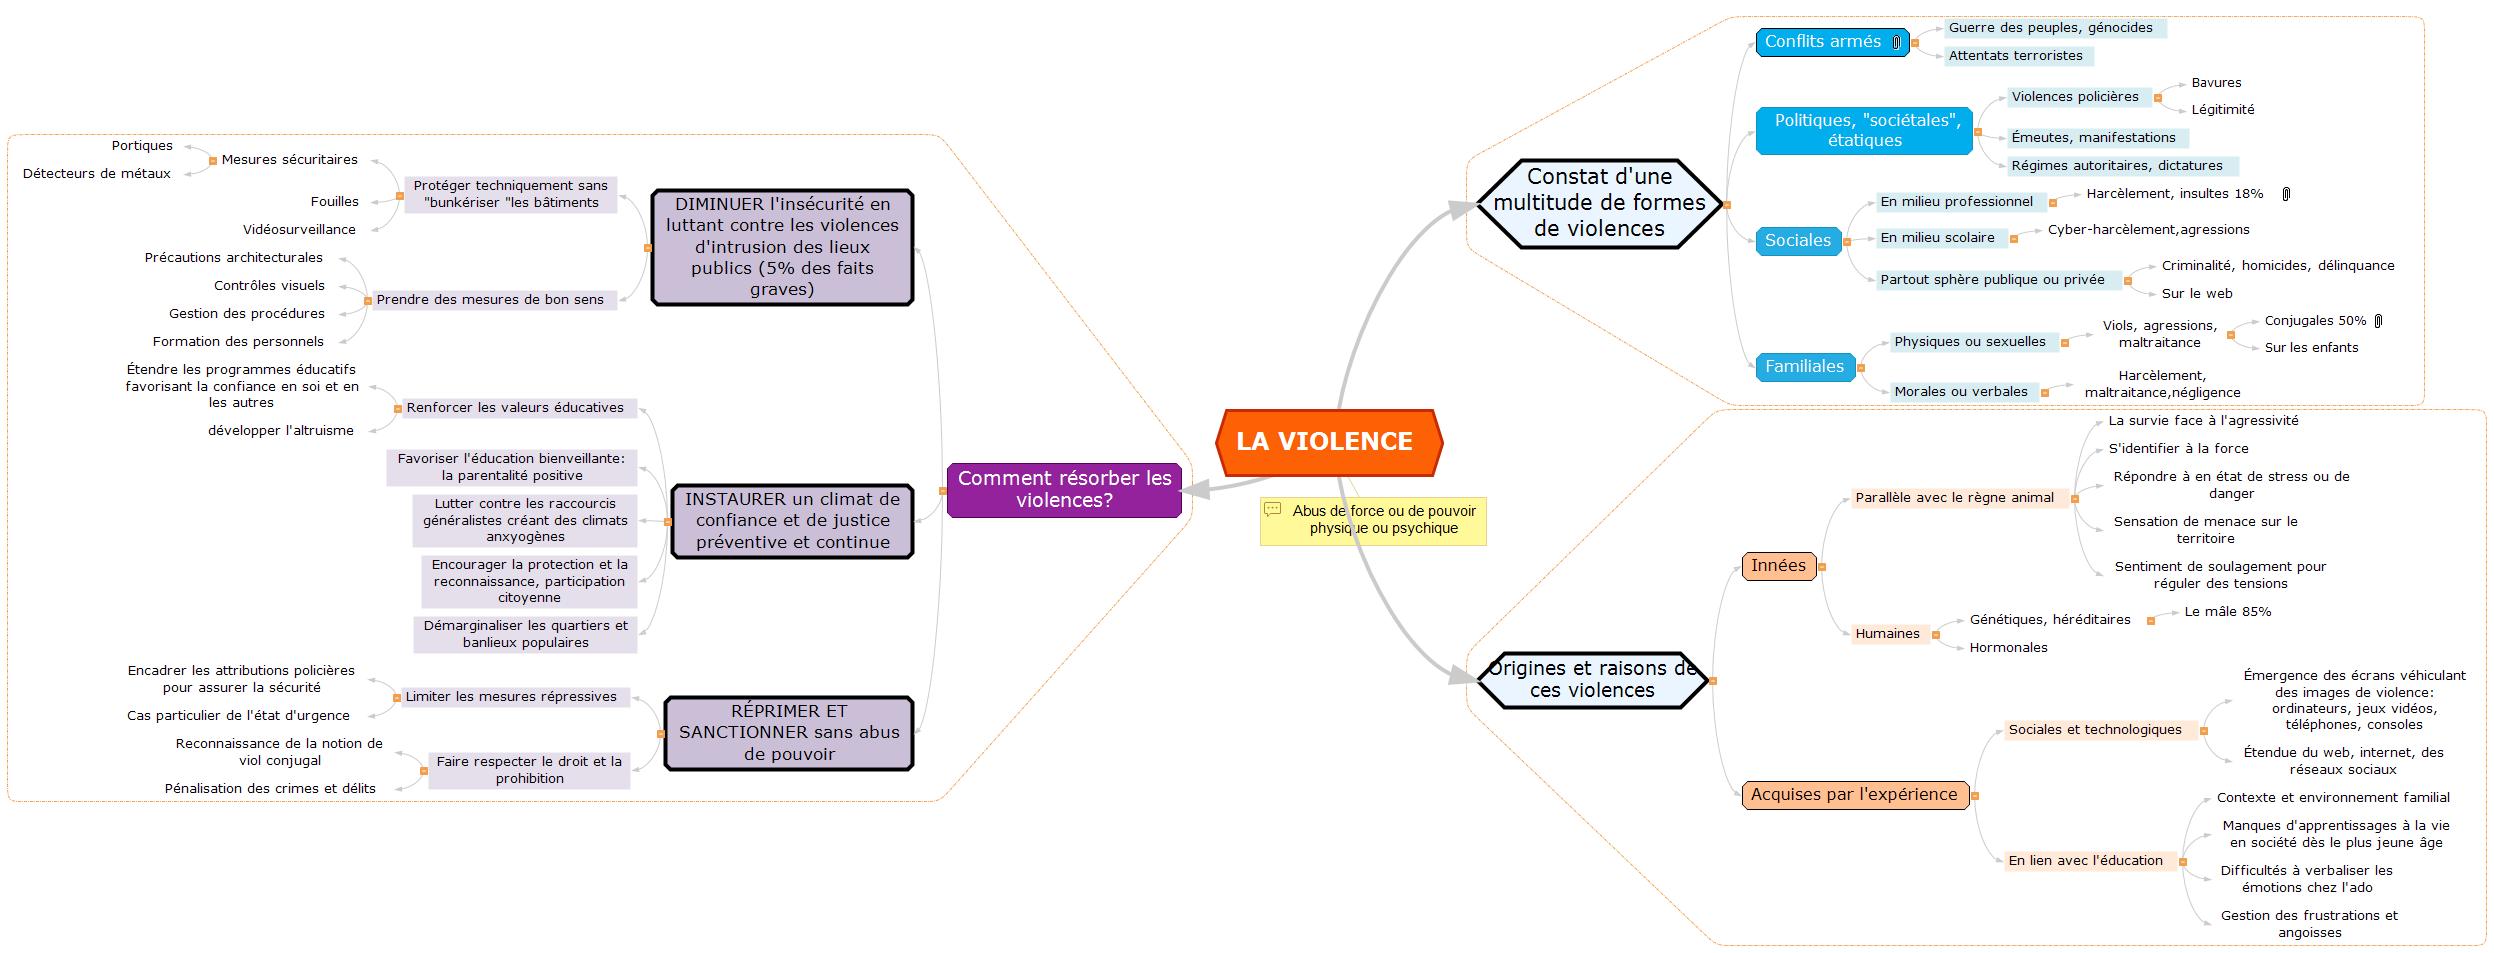 LA VIOLENCE carte mentale Mind Maps